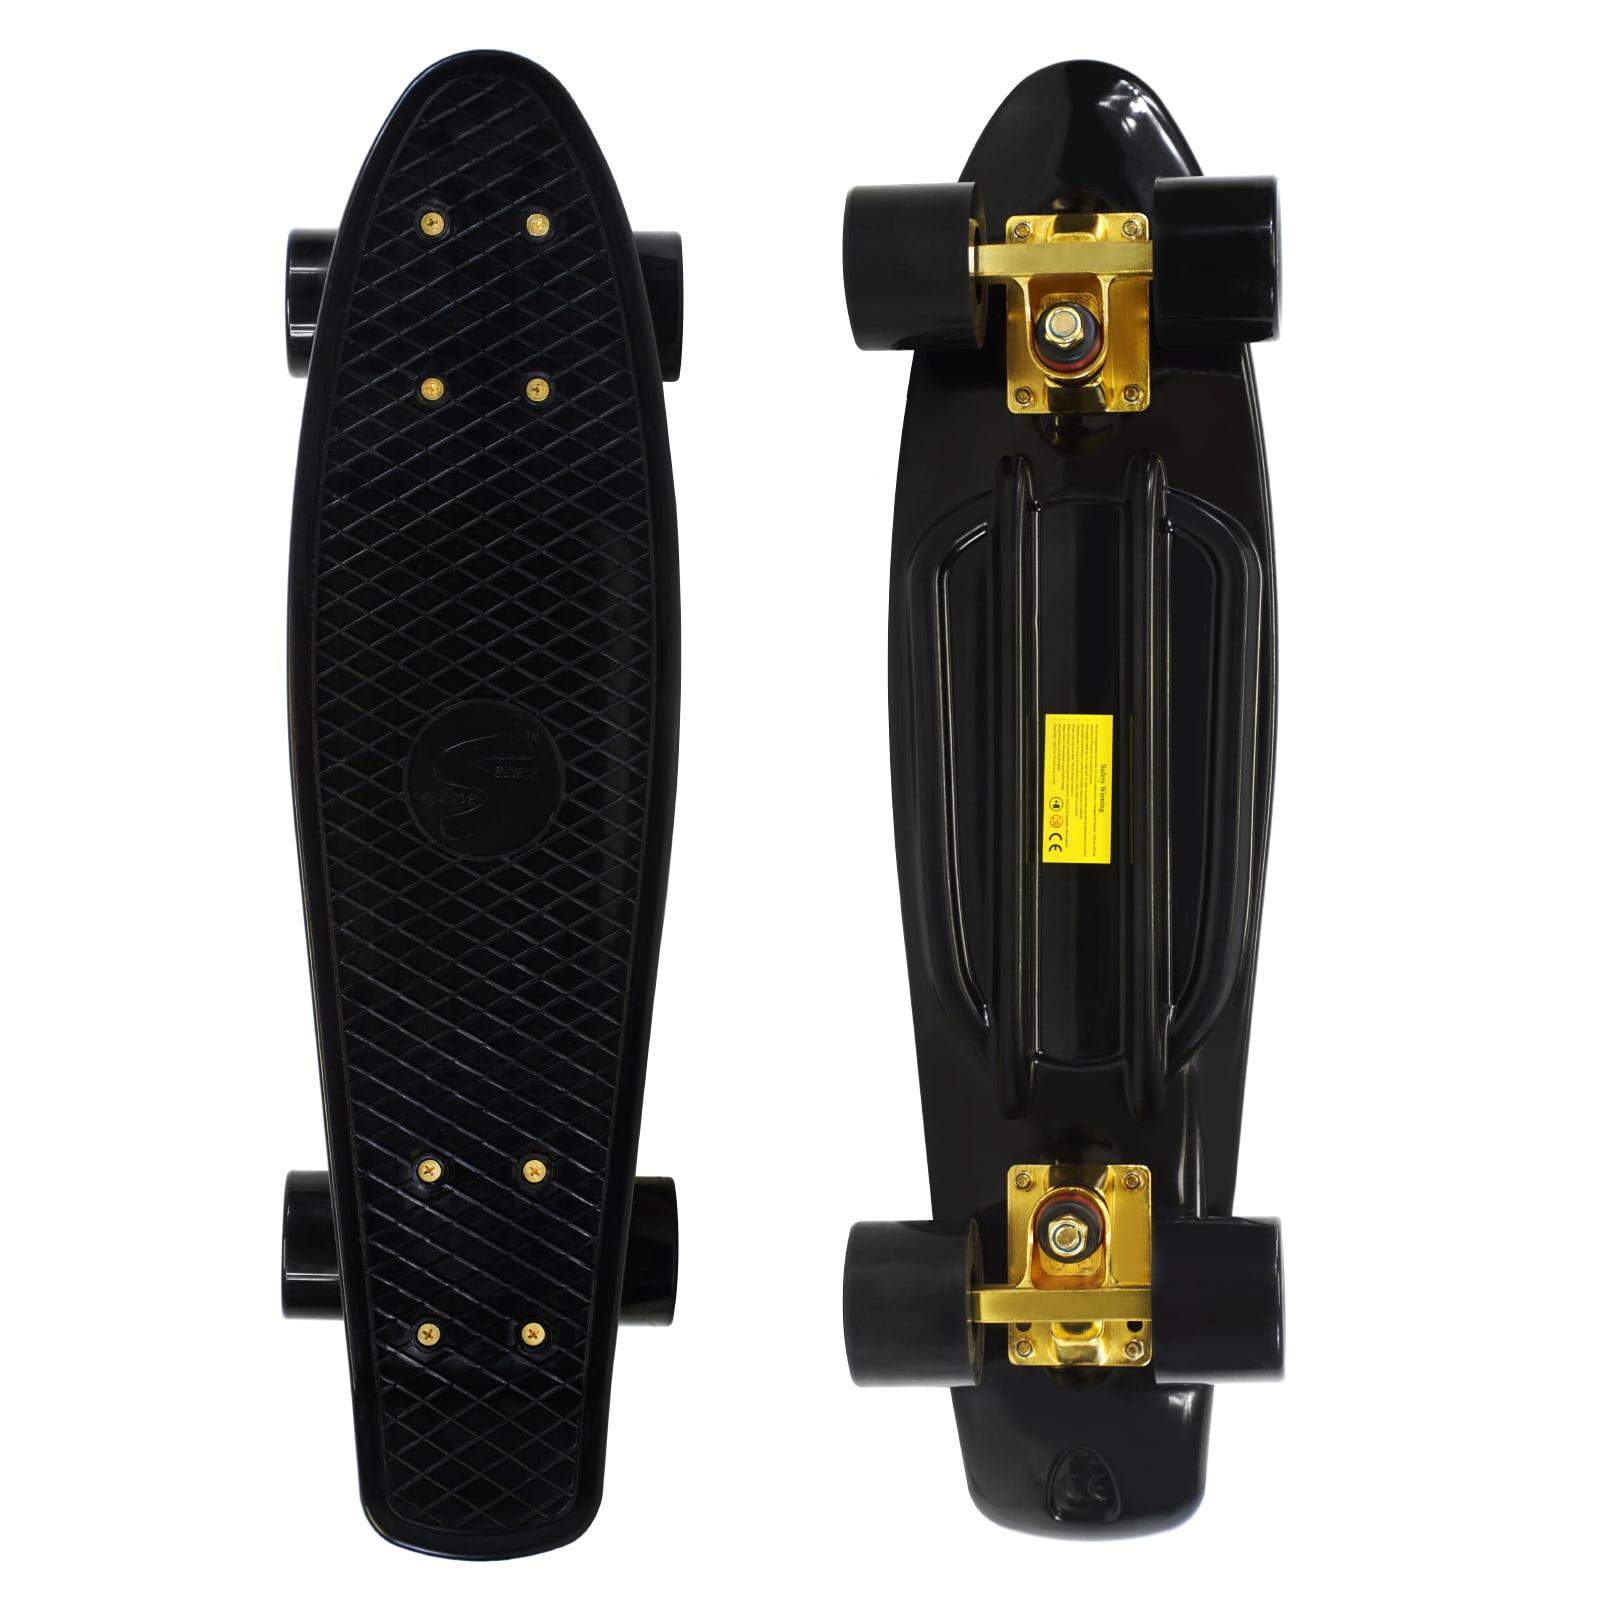 Penny Style Cruiser 22 inch Board Plastic Retro Mini Skateboard Complete, Black Gold by Scale Sports